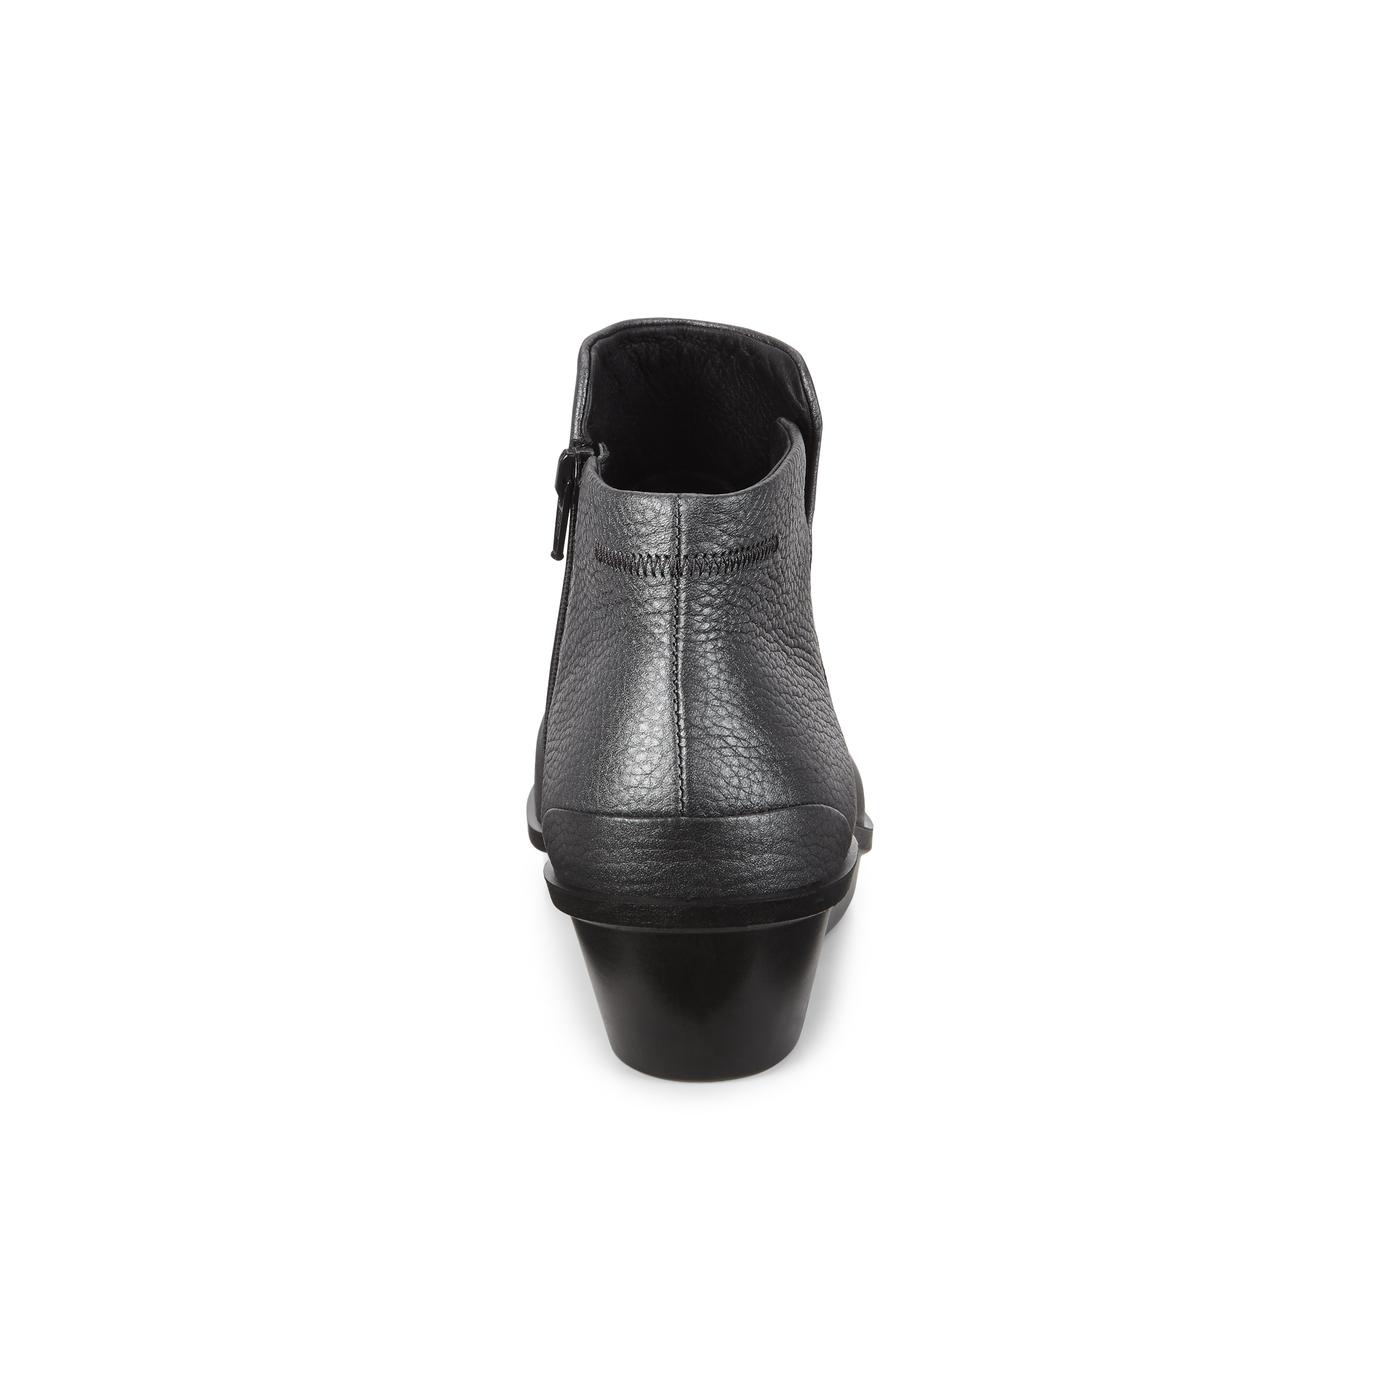 ECCO SKYLER Nuback Short Boot